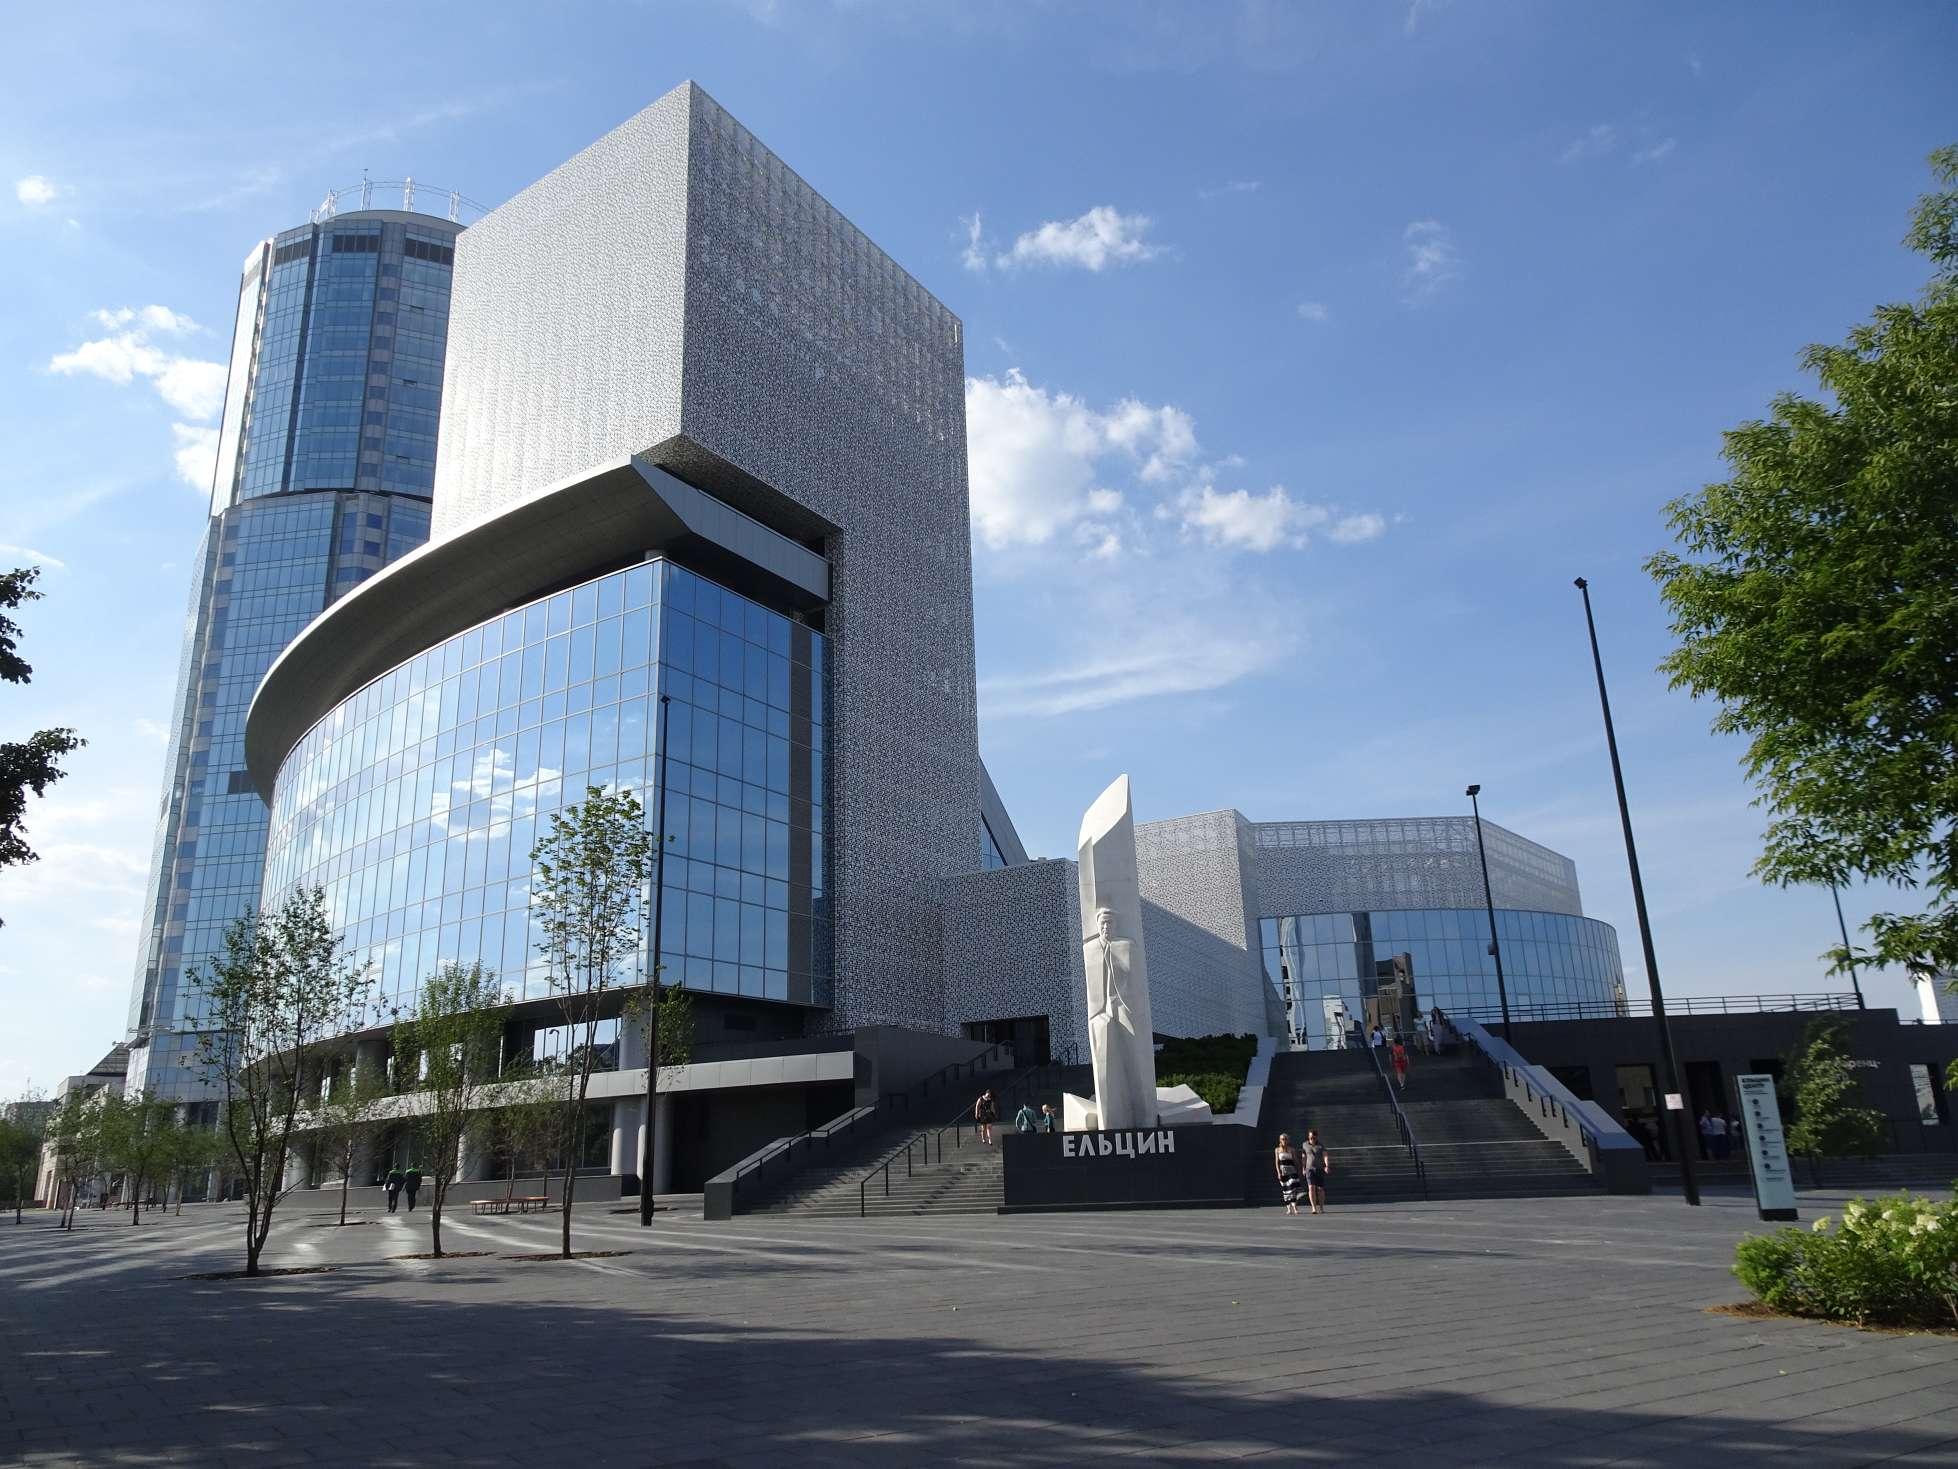 Neuer Tagungskomplex, incl. Museum für Boris Jelzin.